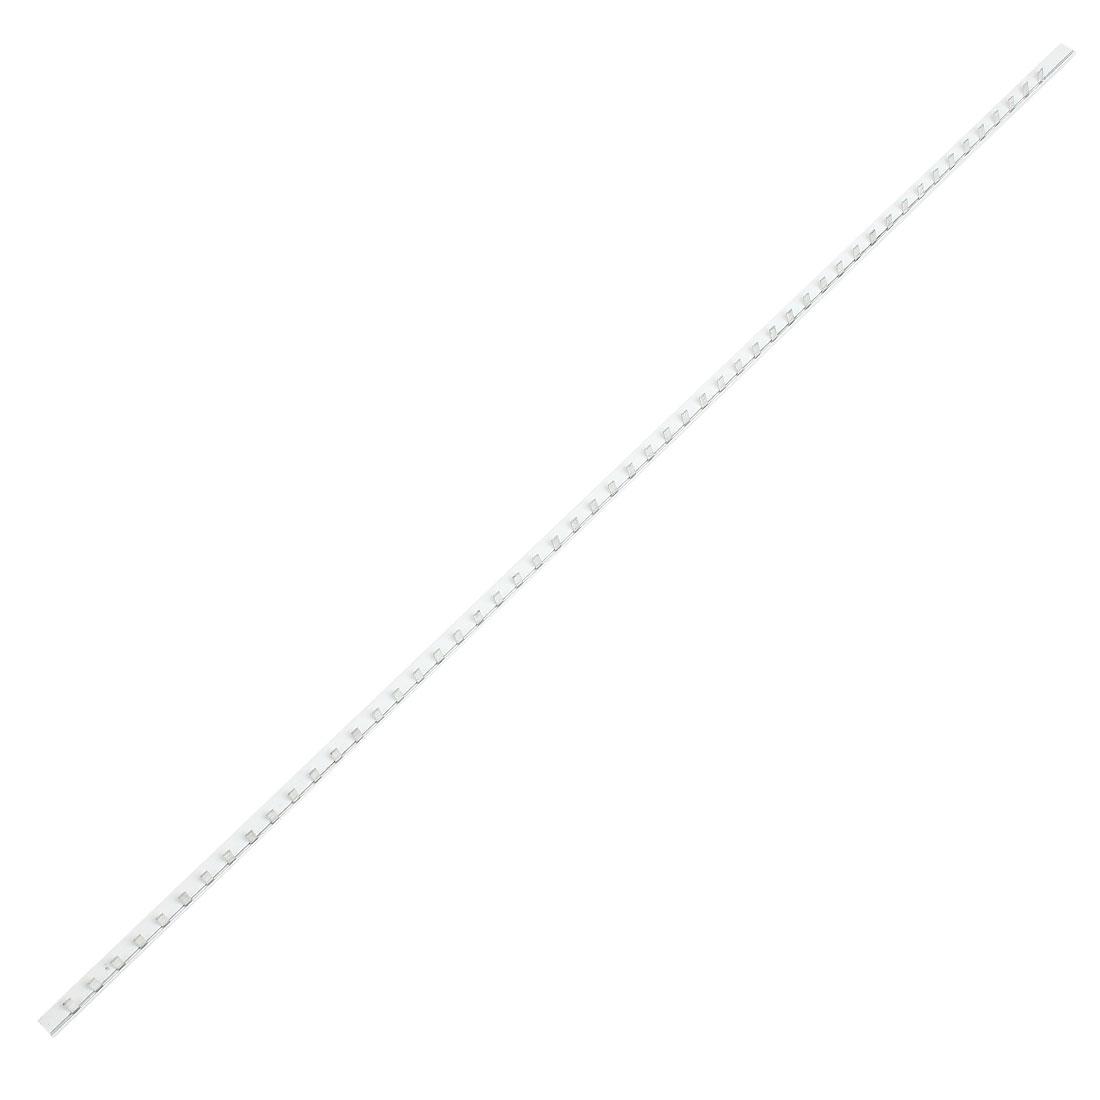 101cm Long Metal Pin Type 1 Pole Connector Busbar for Circuit Breaker